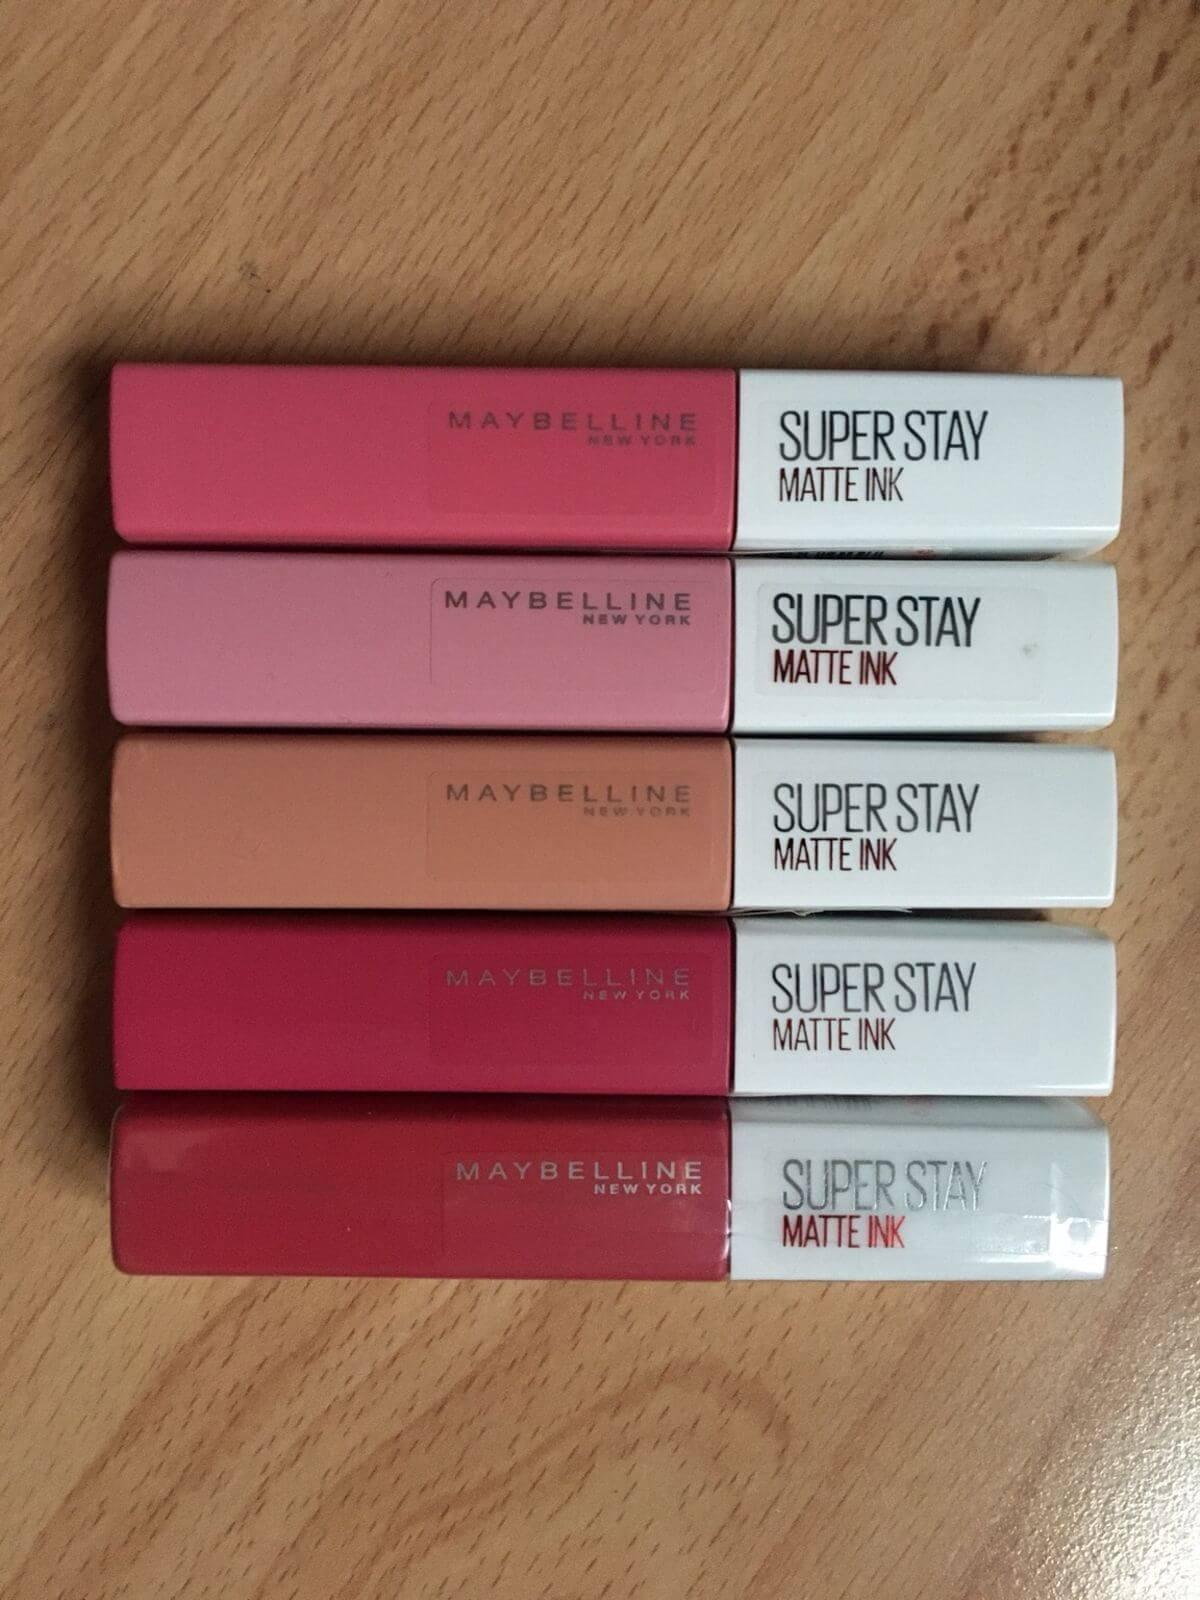 Maybelline New York Super Stay Matte Ink